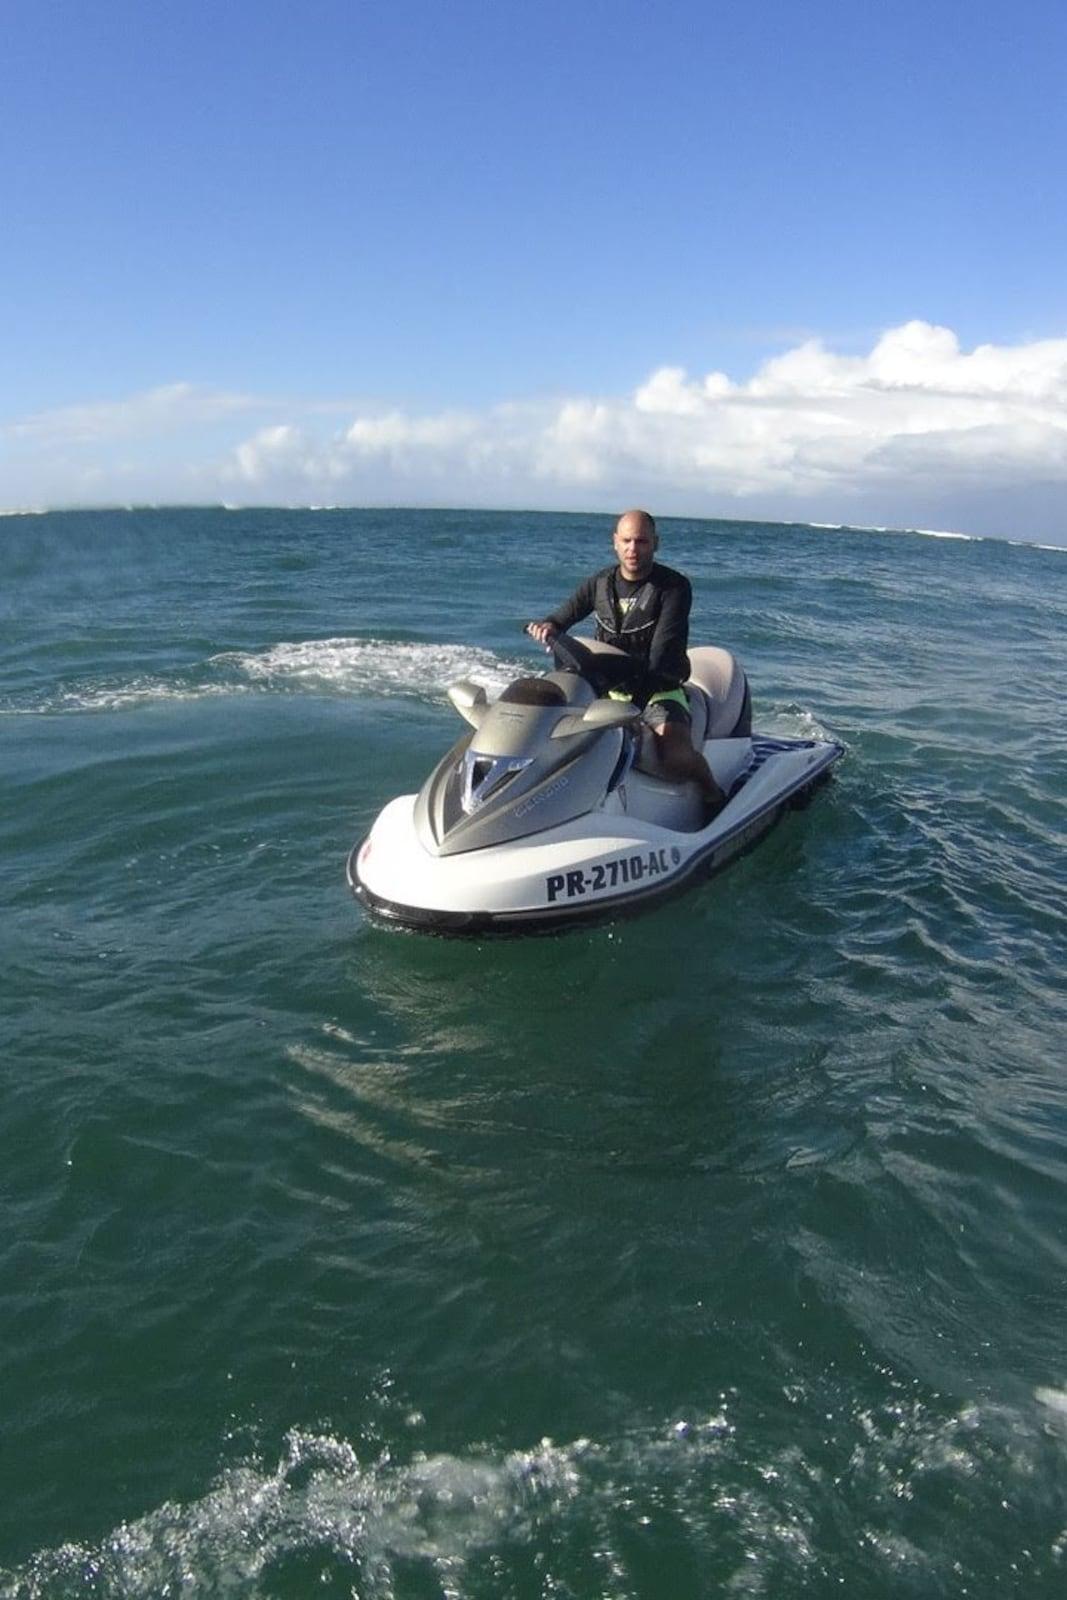 Private Jetski Fun Ride And History Tour